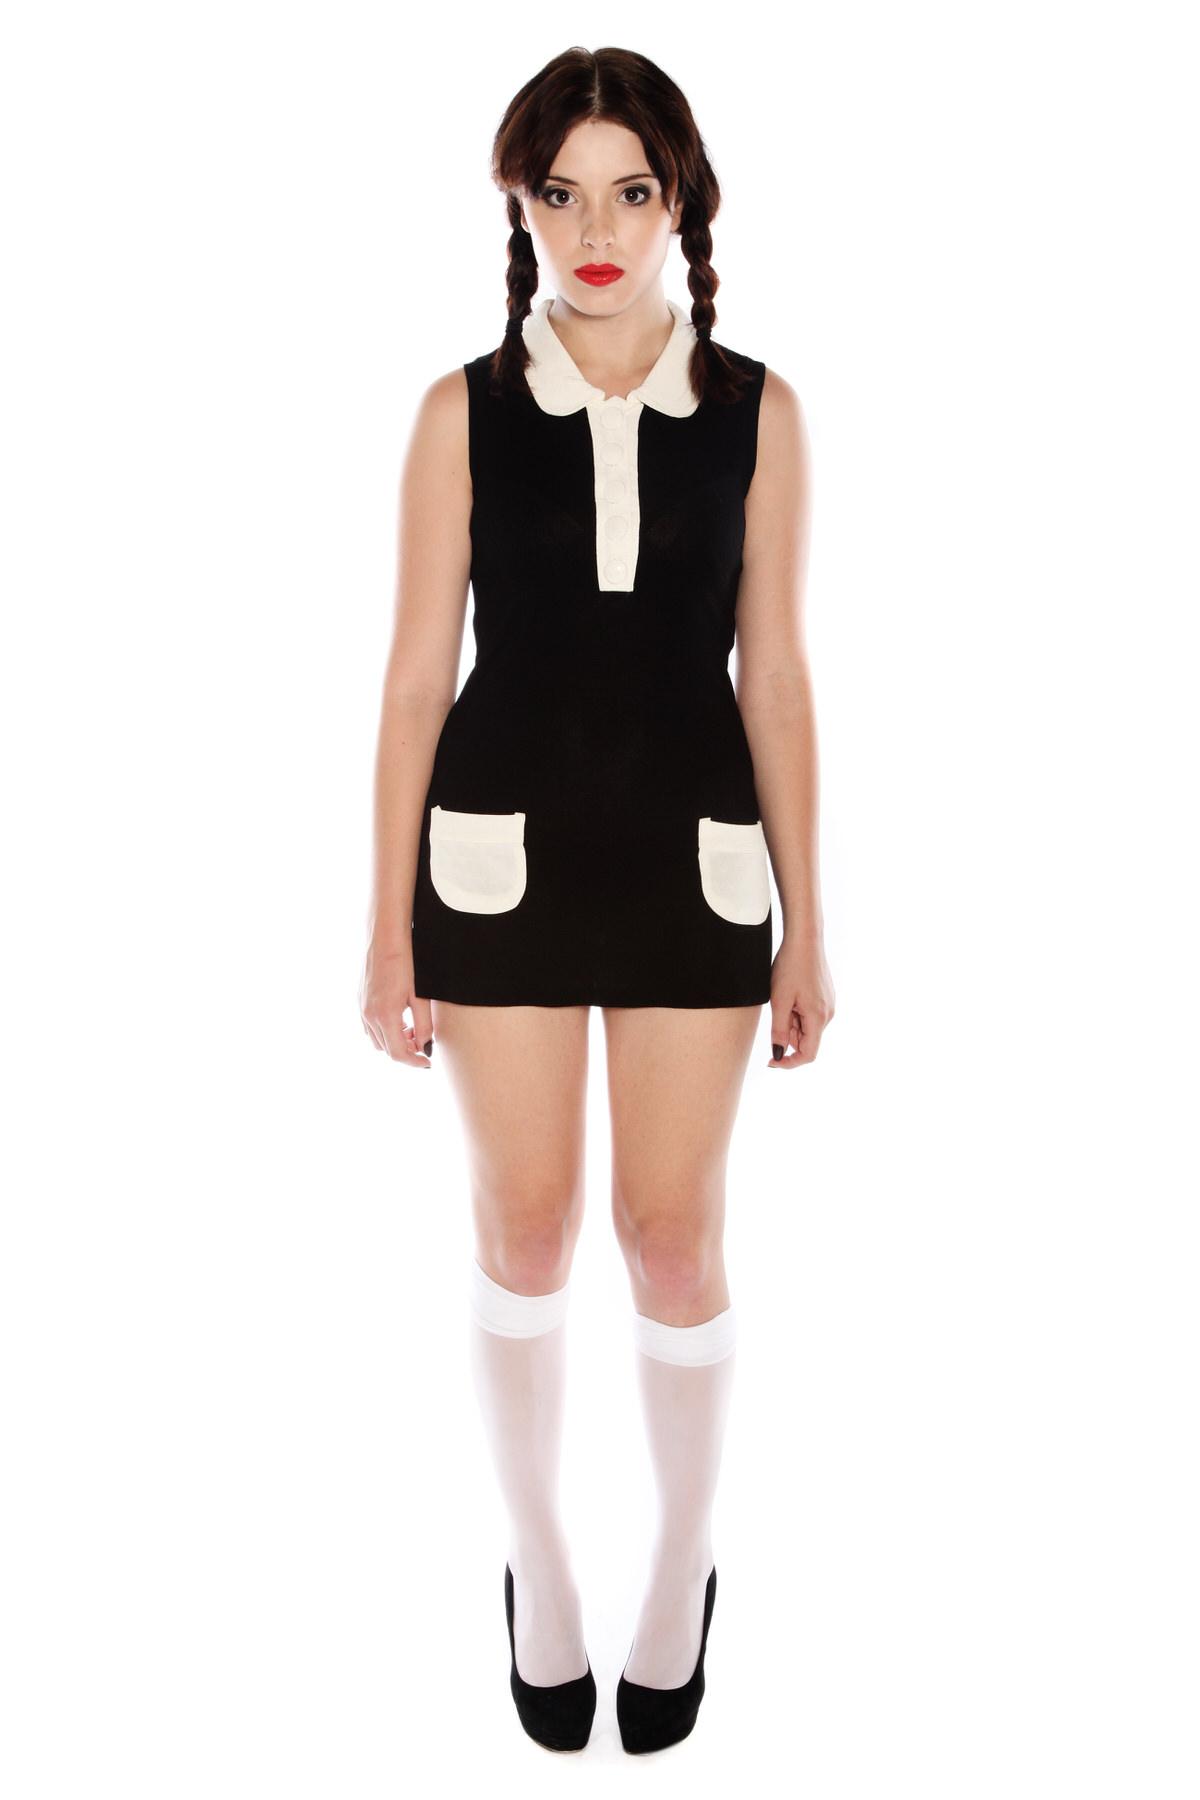 WEDNESDAY ADDAMS BLACK AND WHITE DRESS COSTUME